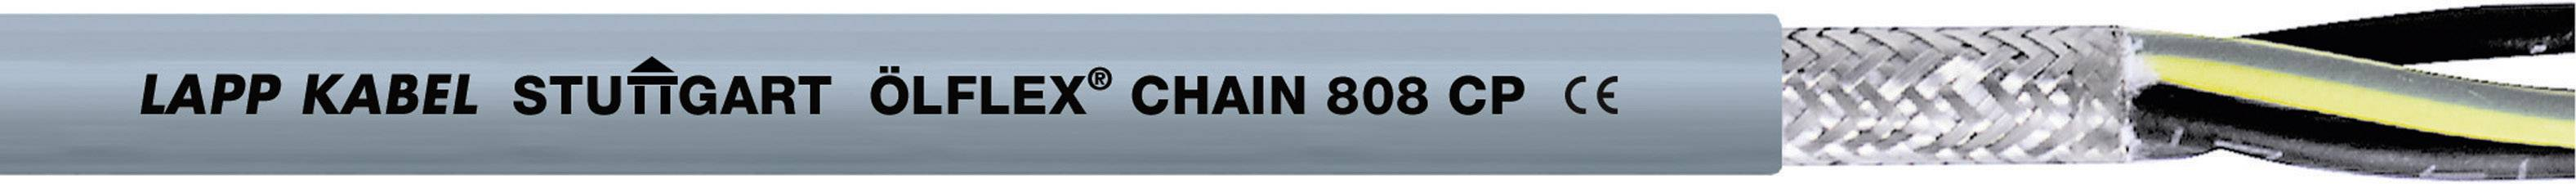 Žíla kabelu LappKabel ÖLFLEX CHAIN 808 CP 4G4 (1027788), 4x 4 mm², polyurethan, Ø 11,9 mm, stíněný, 50 m, šedá